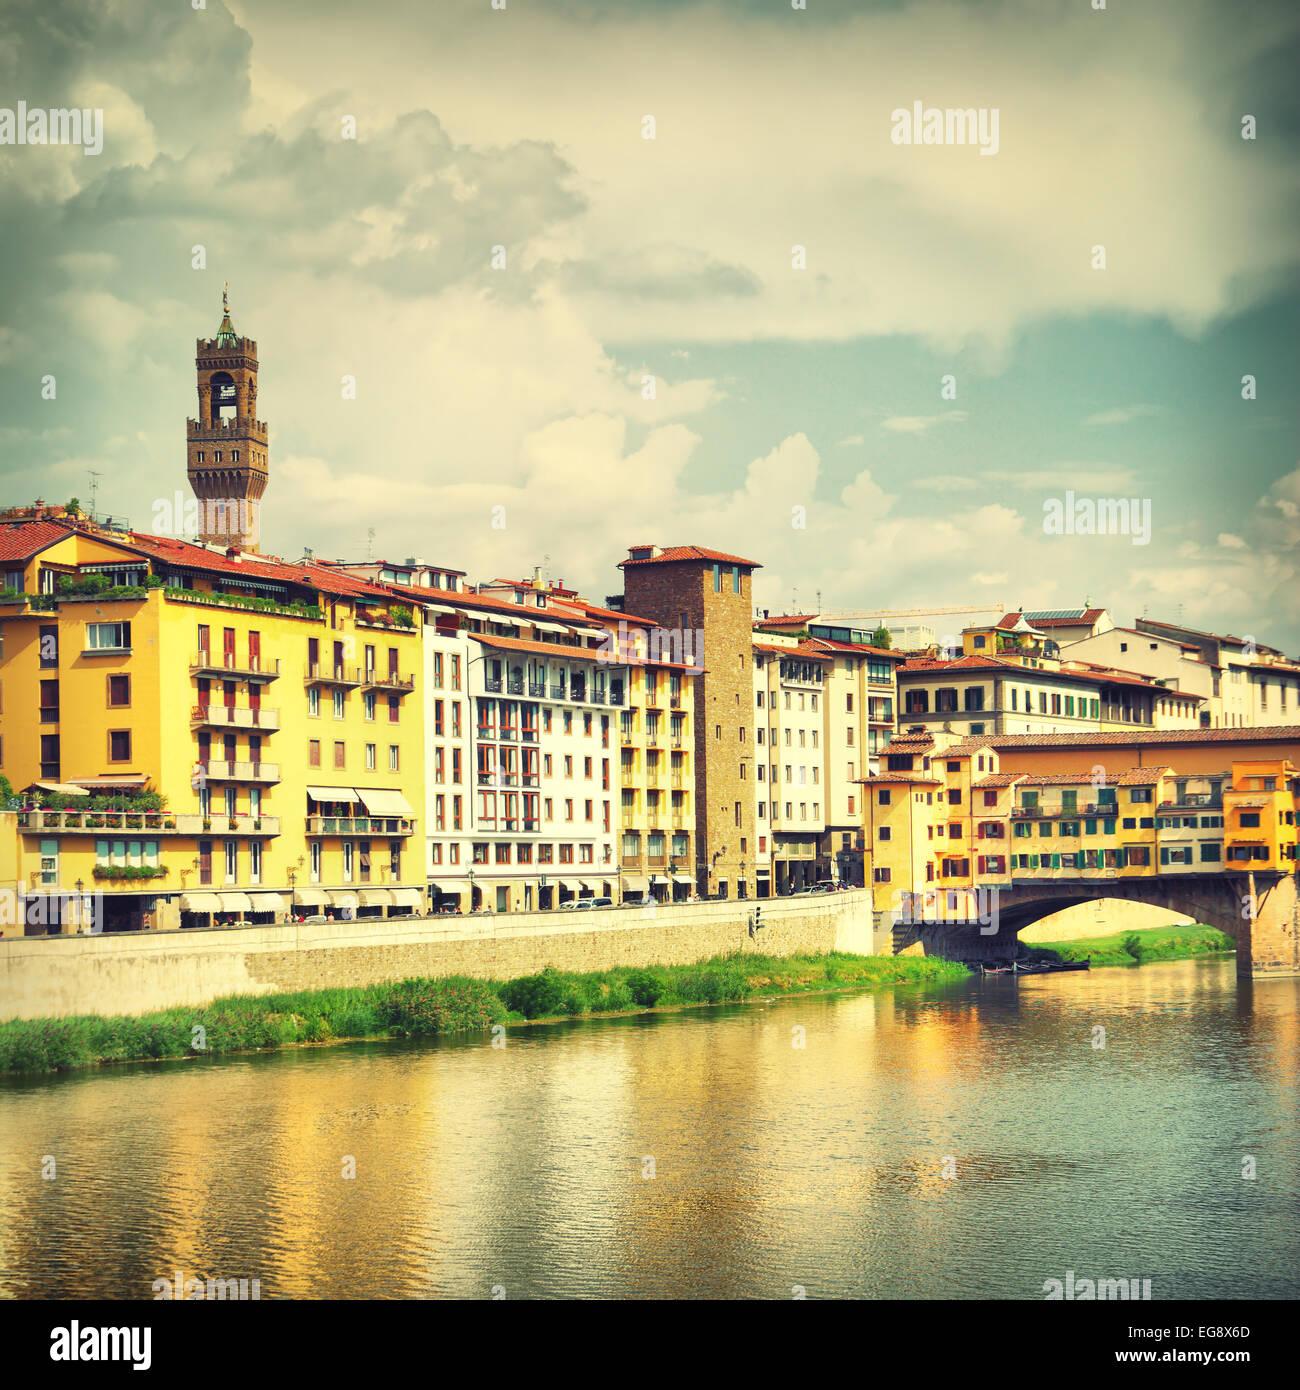 Vista de Florencia, cerca del Ponte Vecchio, Italia Imagen De Stock